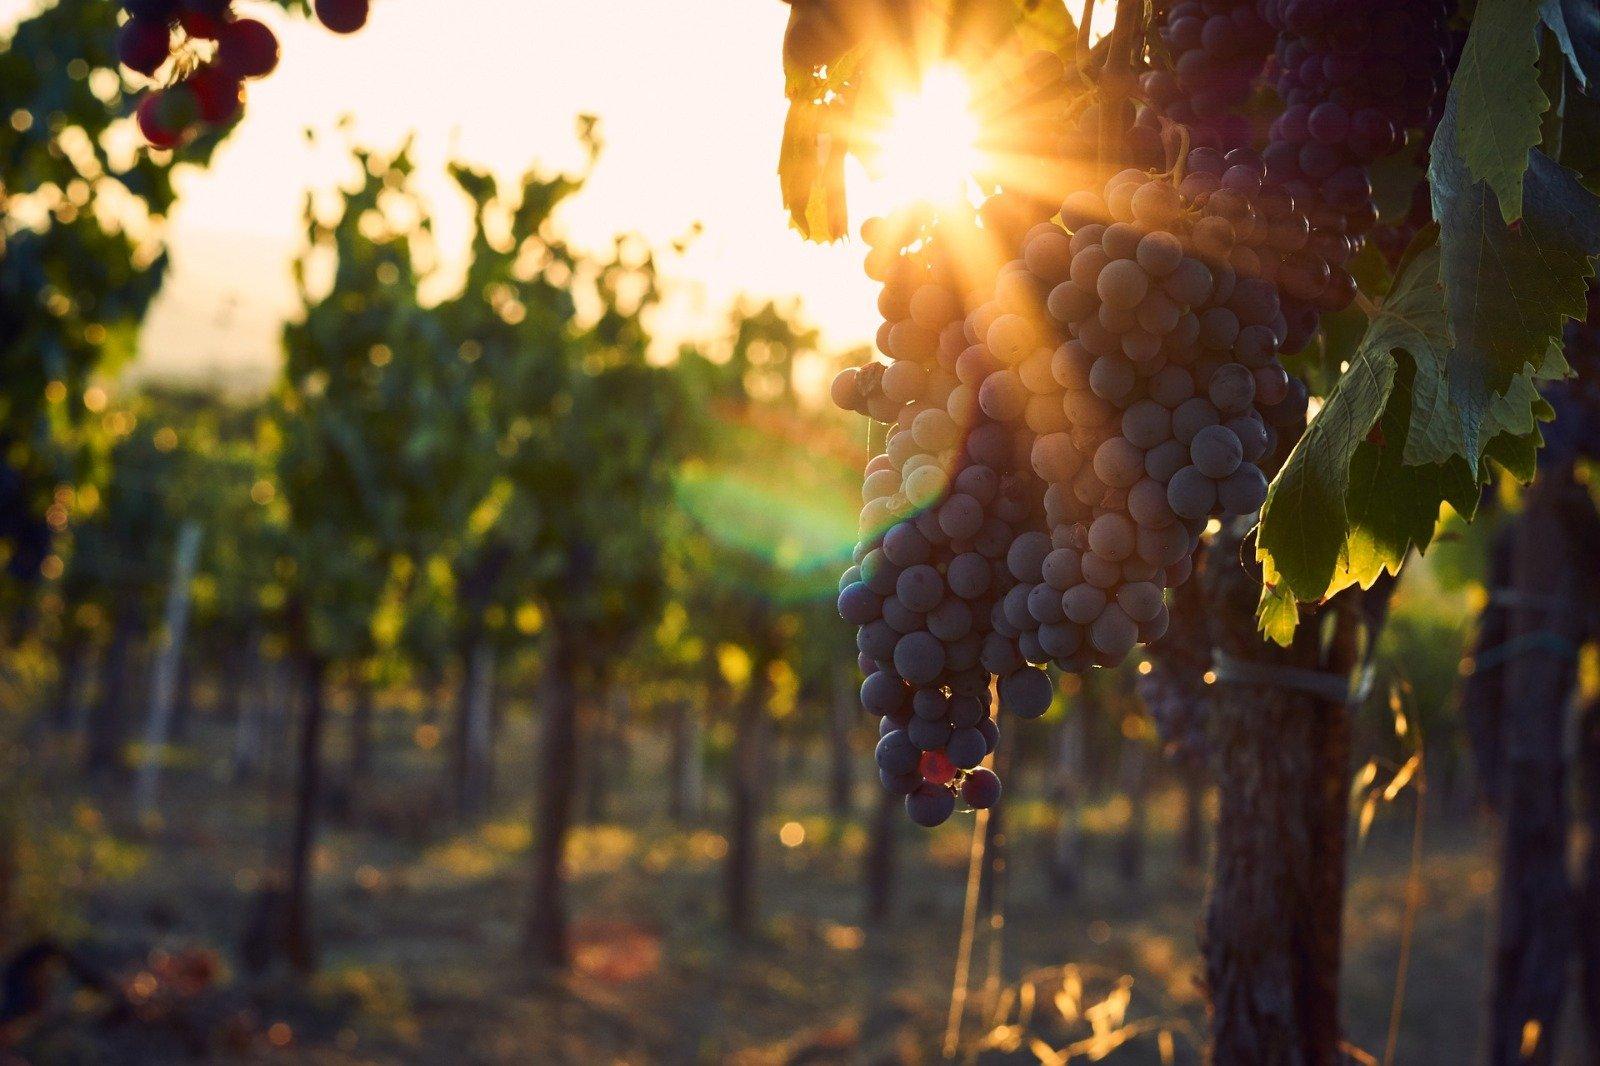 Enjoy A Walk Over The Vineyards On The Wine Tasting Experience In Bardolino (lake Garda)_52